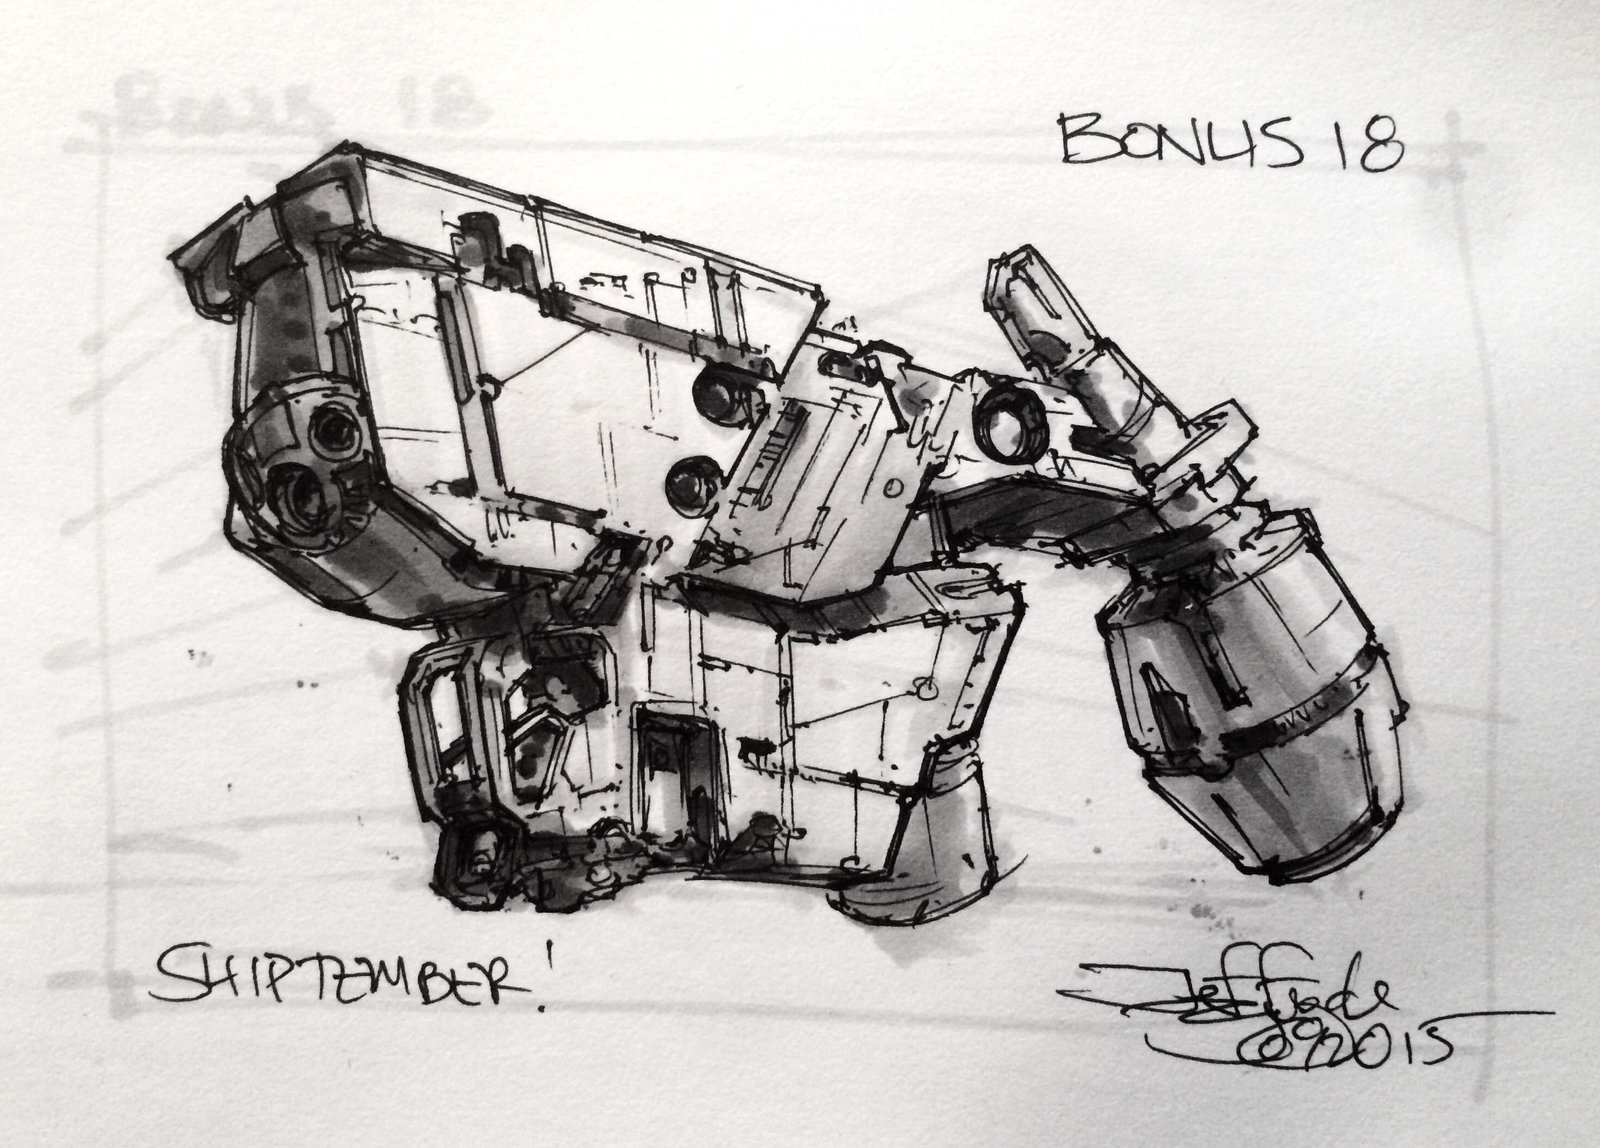 Shiptember Bonus 18